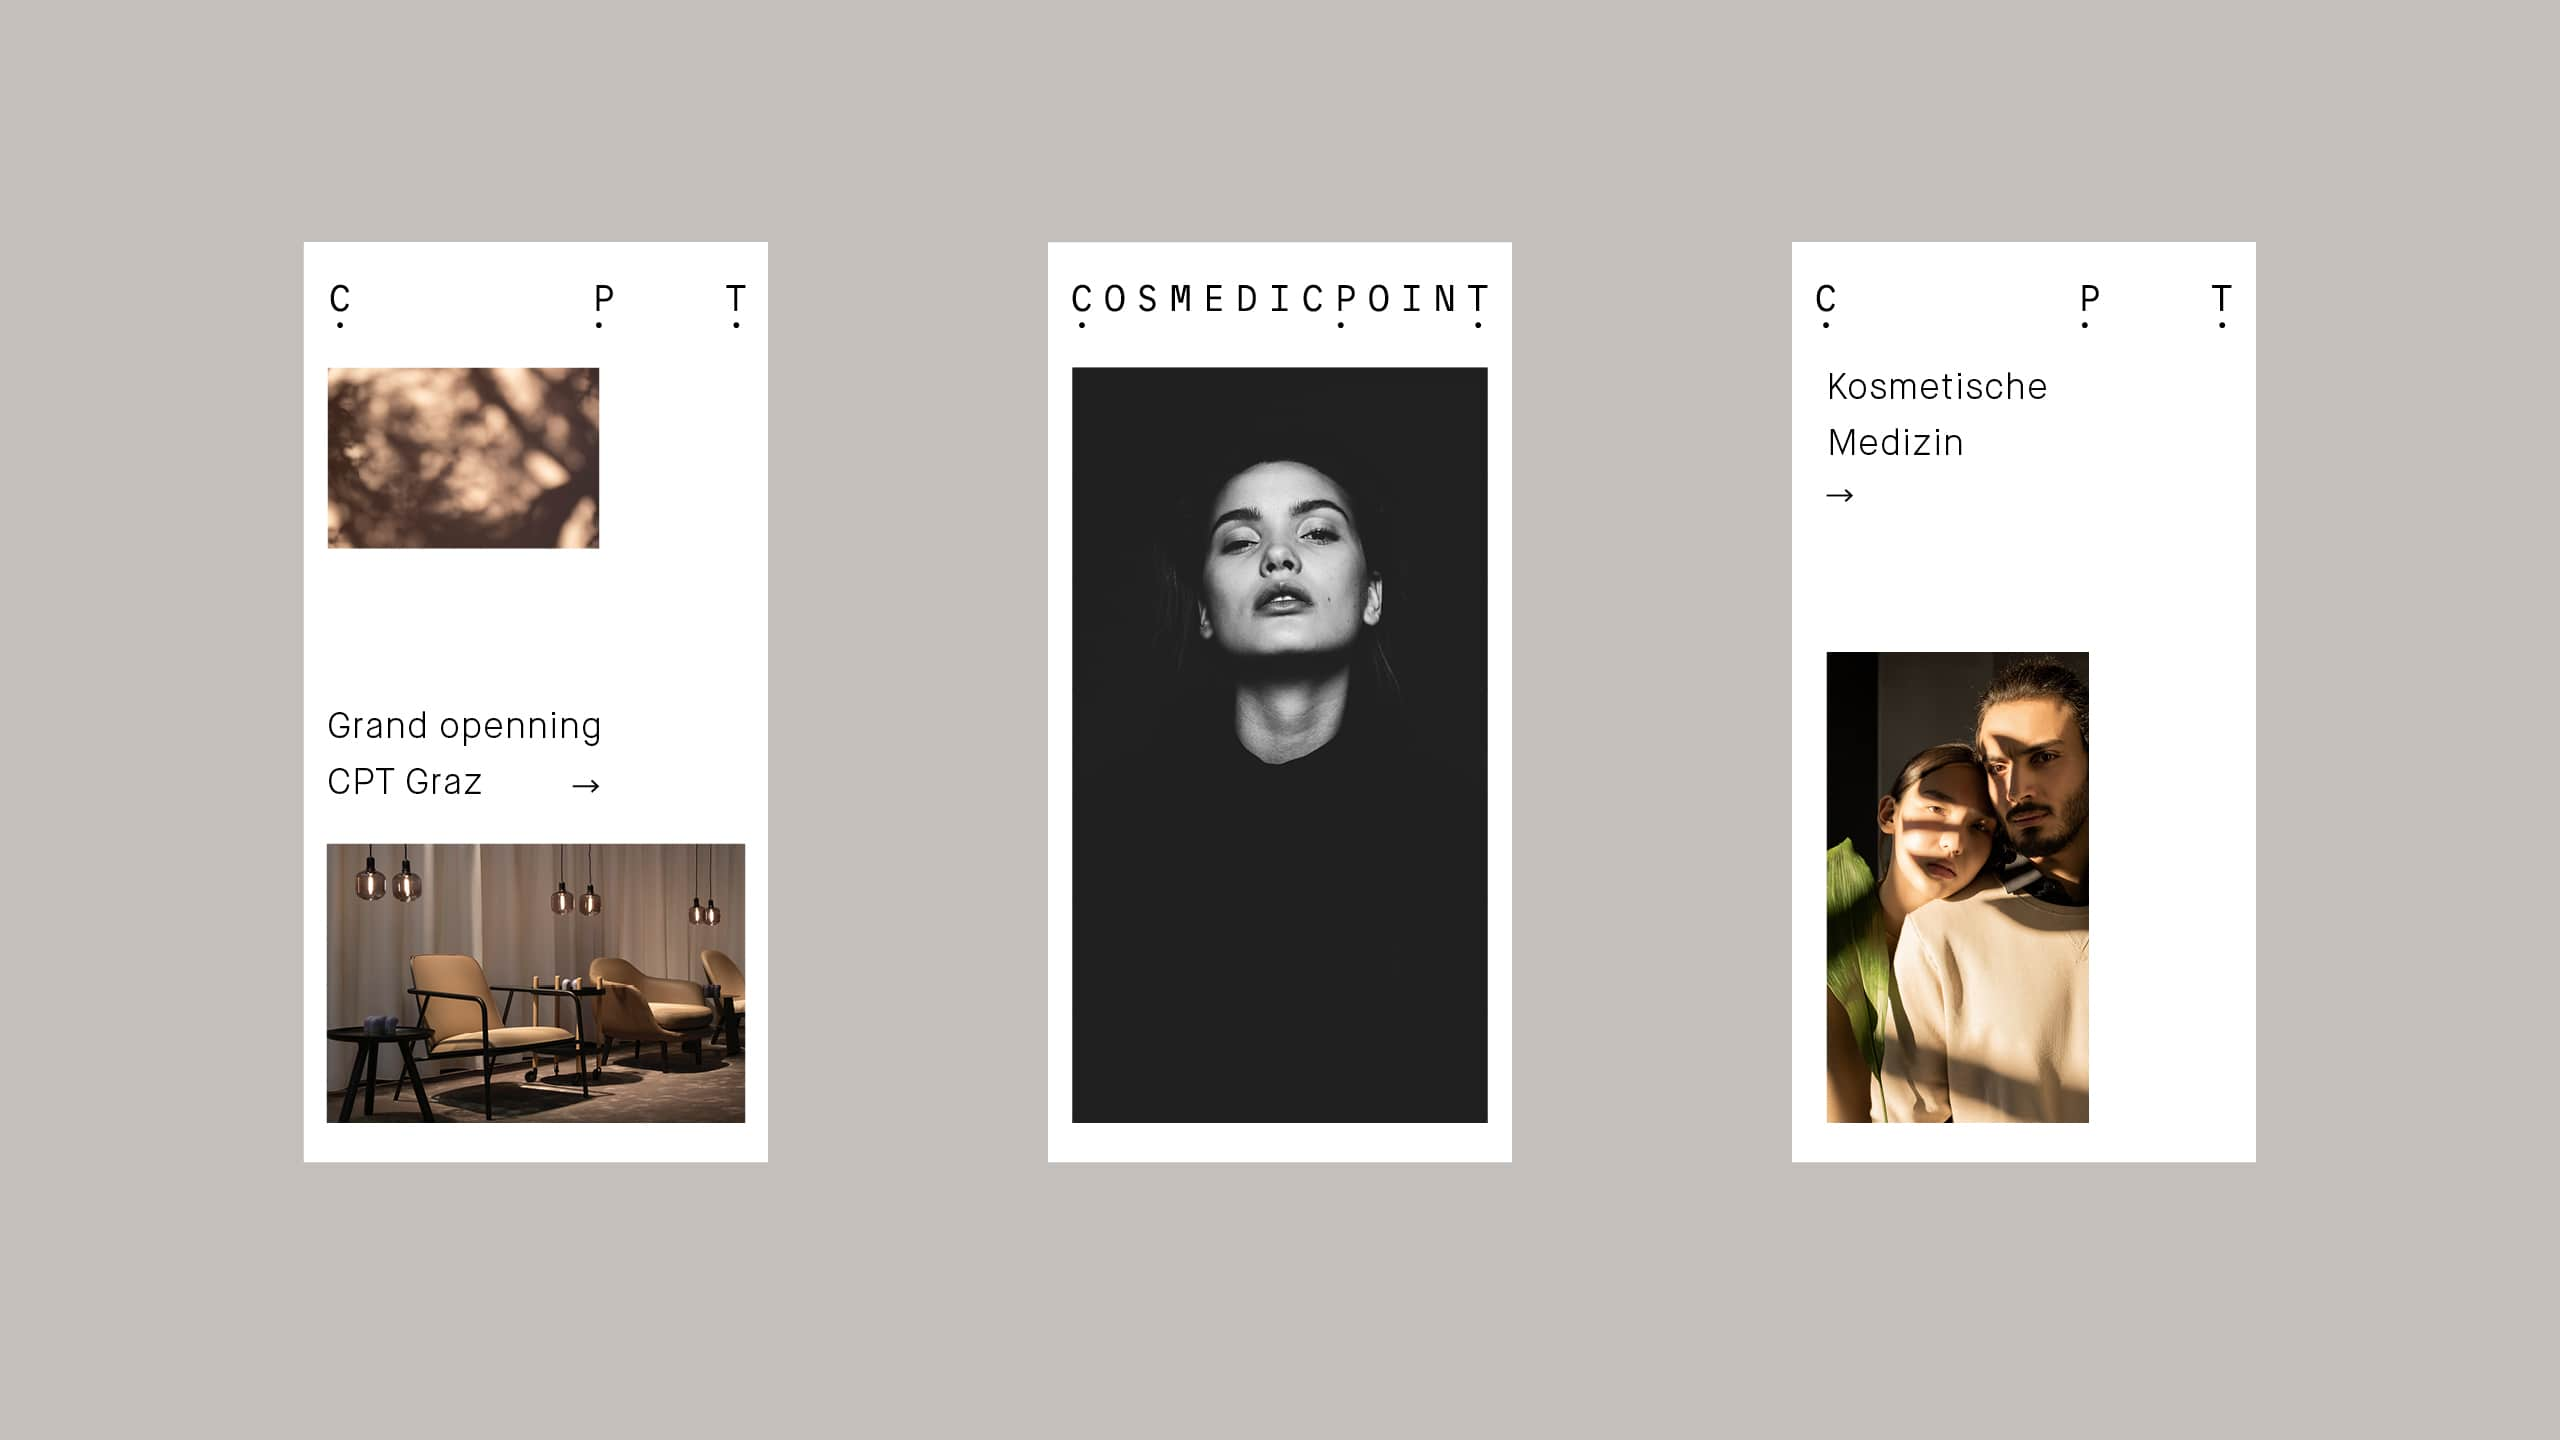 mantik-digital-branding-development-agency-chocolate-packaging-webdesign-design-317-min